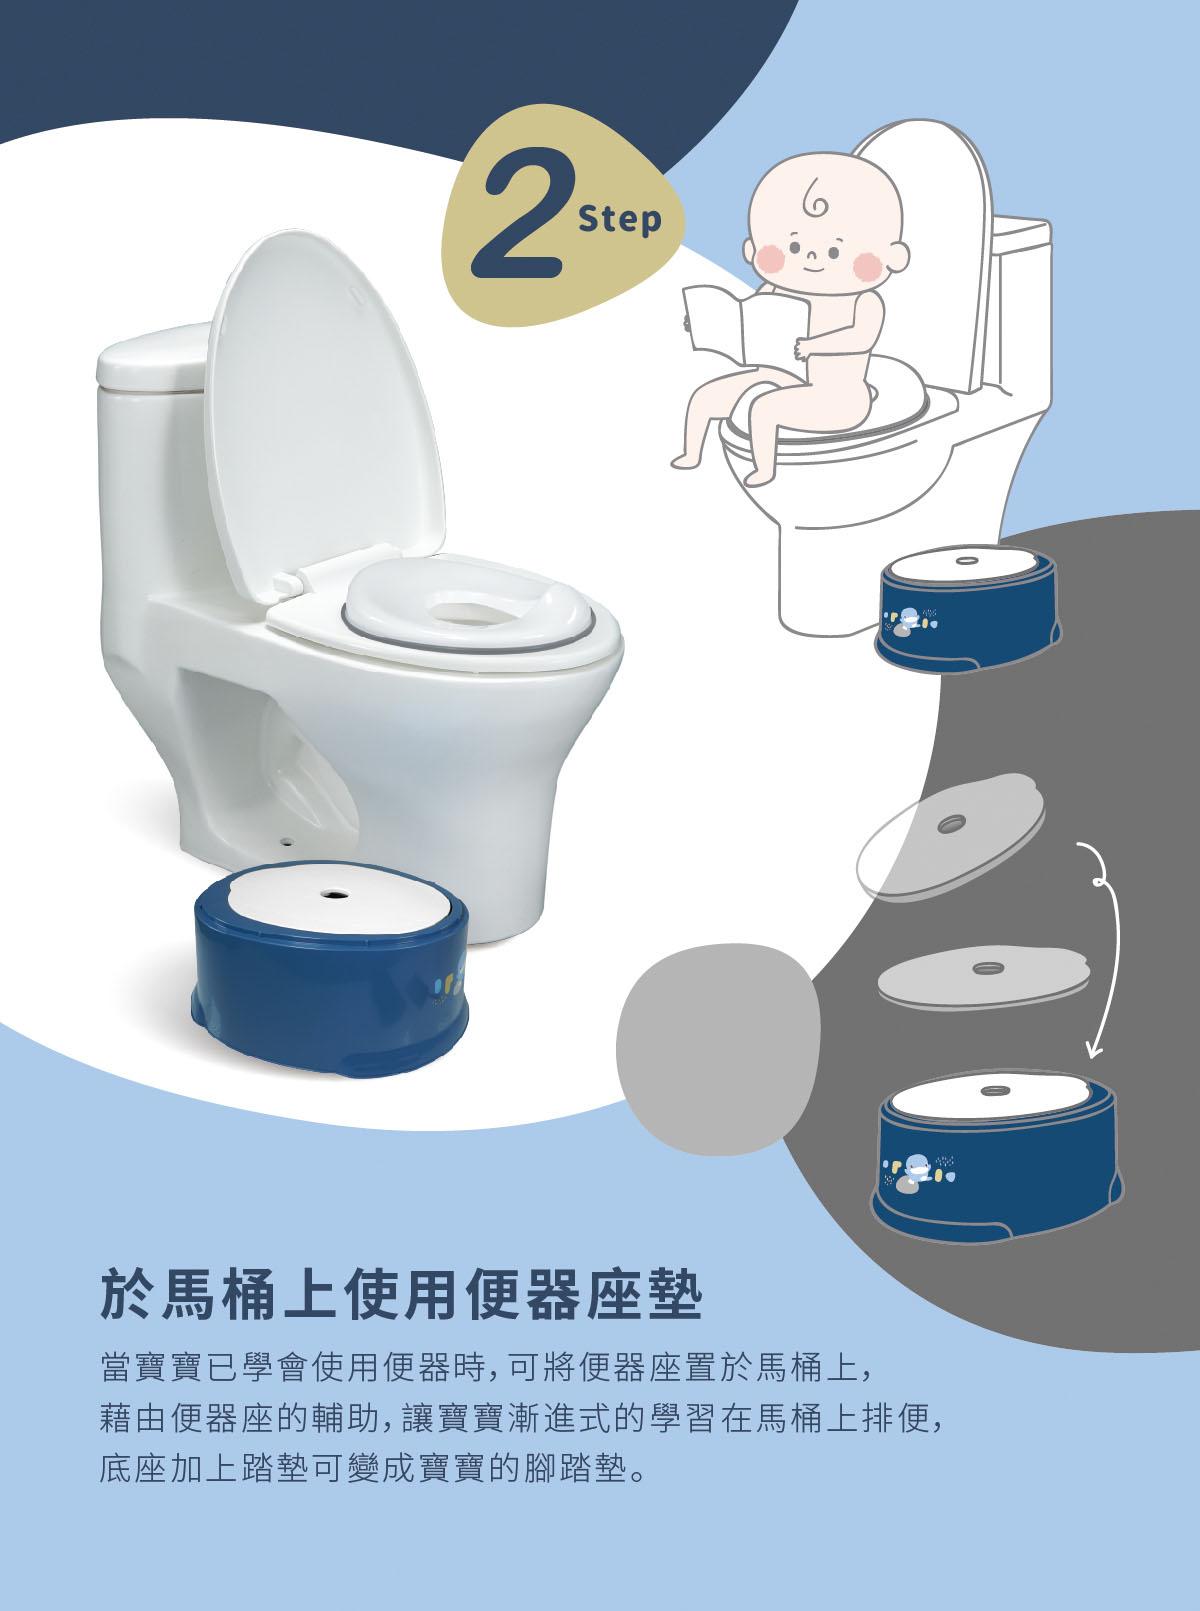 proimages/Bathing&CleanSeries/potty/1137/1137-EDM-4.jpg